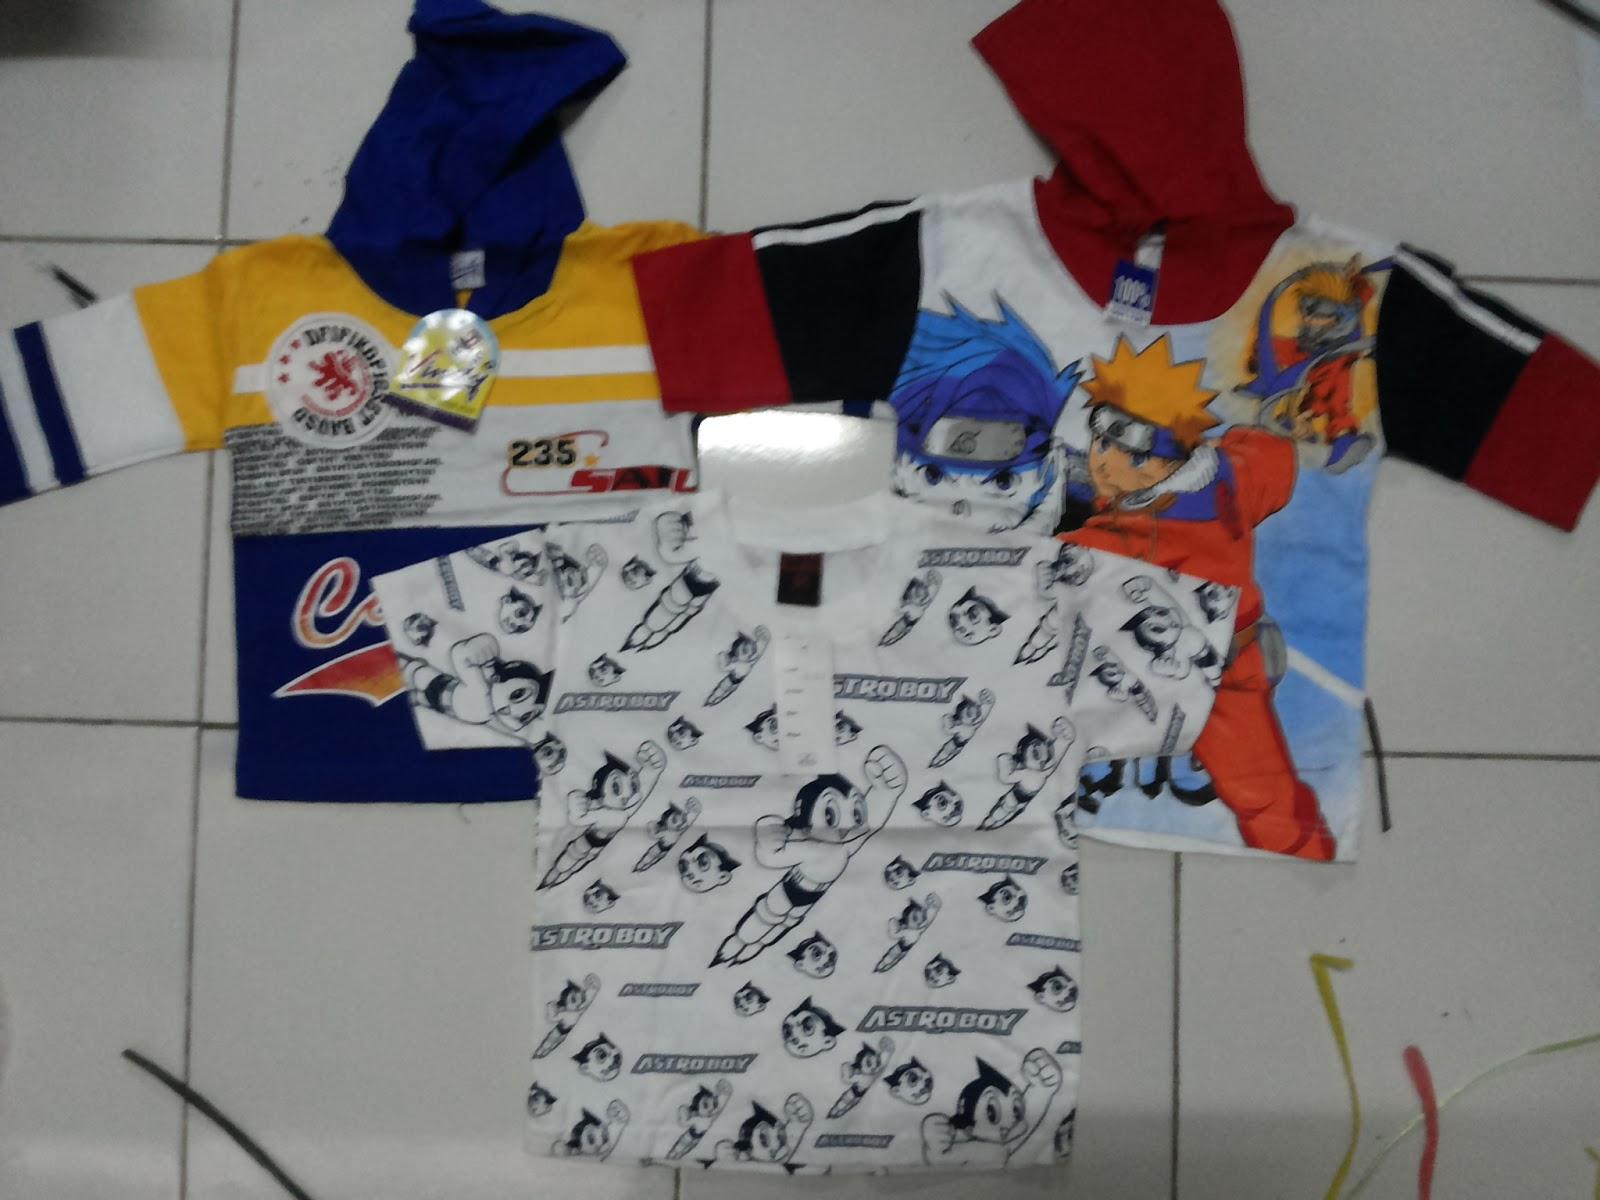 Pusat Obral Grosir Baju Anak 5000 Mukena Katun Jepang Murah Meriah Langsung Dari Pabrik Grosir Kaos Jersey Bola MU 15rebu hygate super